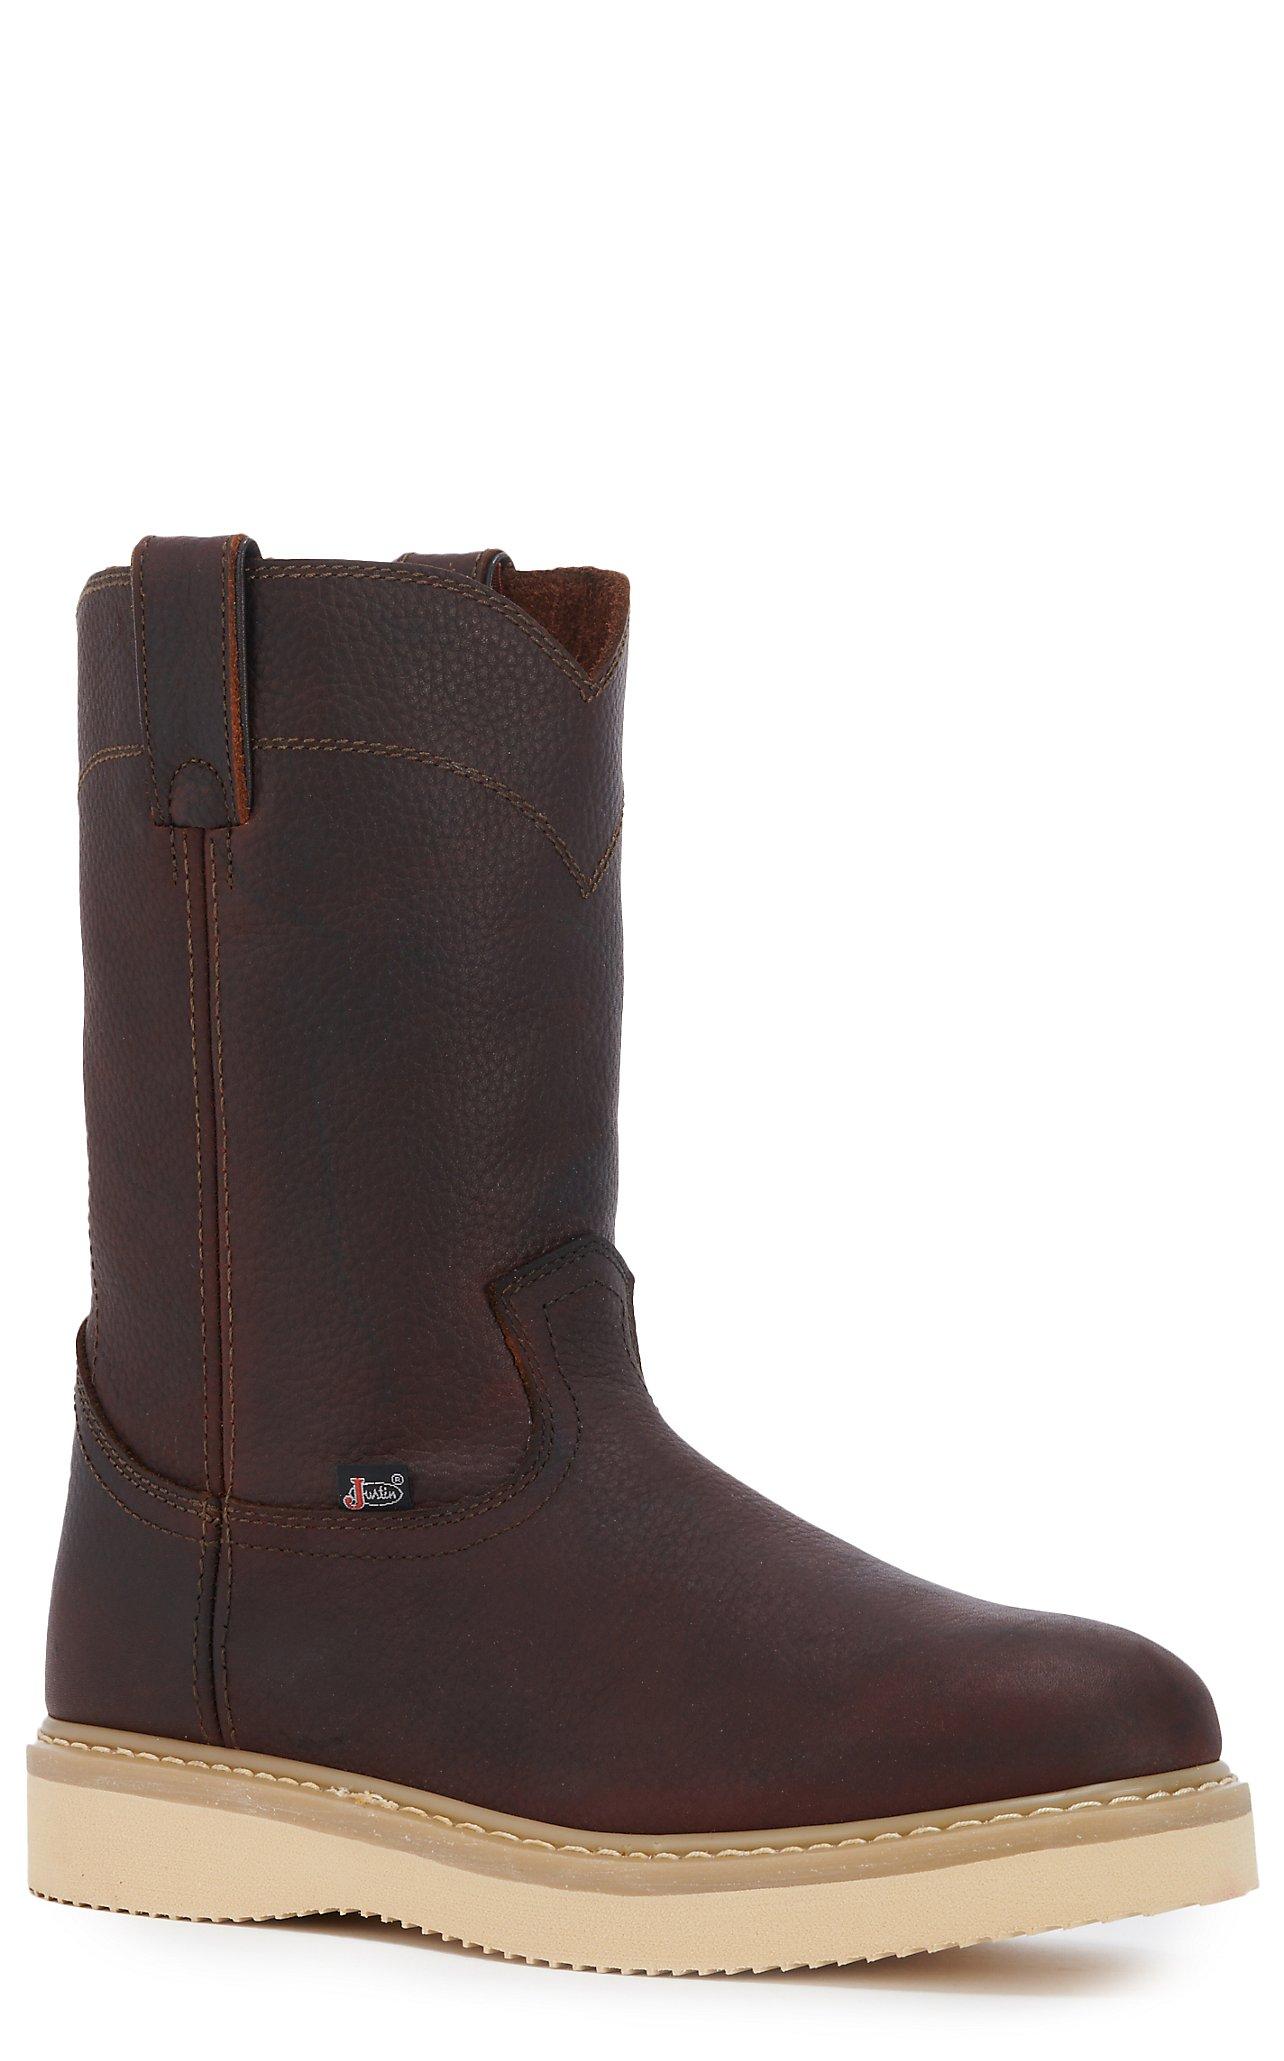 Slip On Work Boots